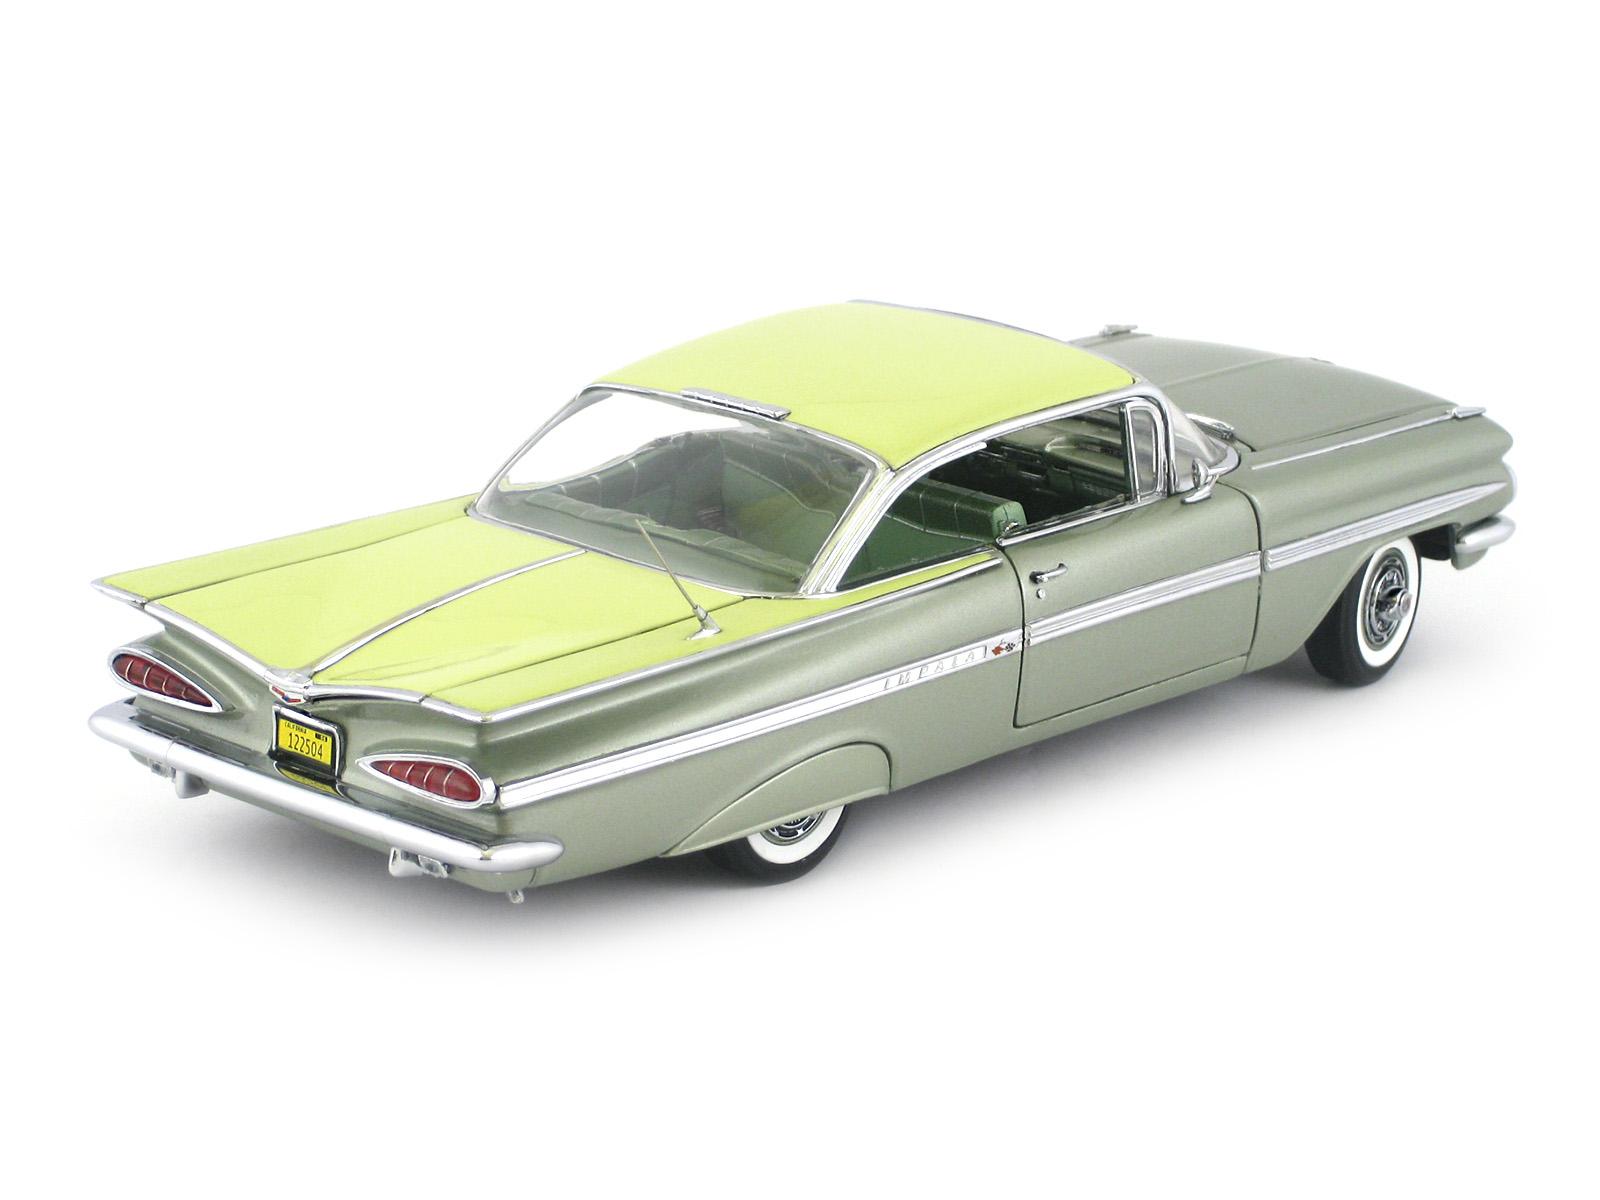 1959 Chevrolet Impala Coupe West Coast Precision Diecast